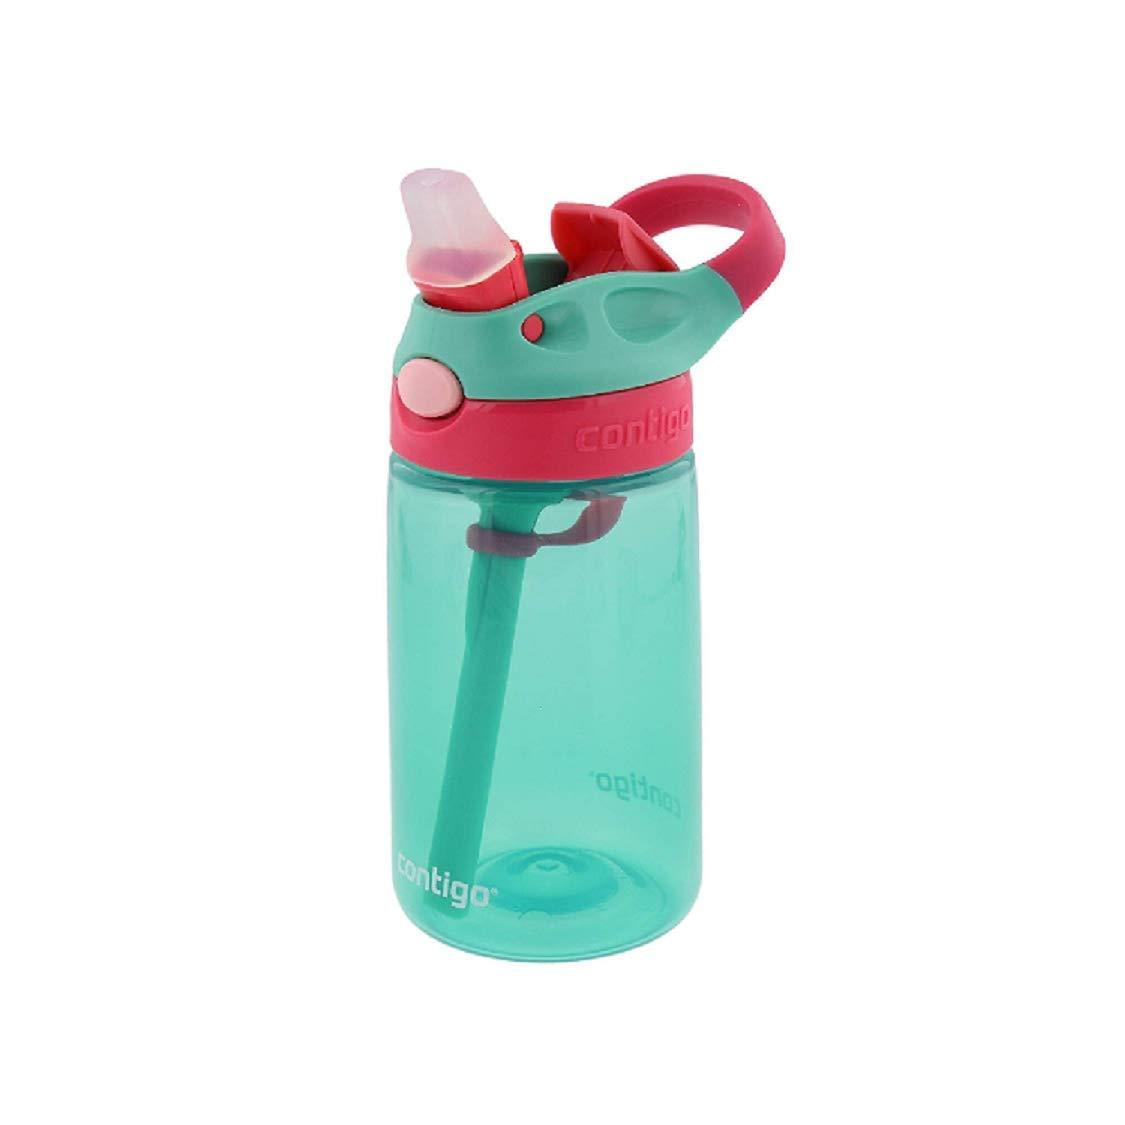 Contigo Kids Autospout Gizmo Water Bottles, 14oz (Perisan Green)